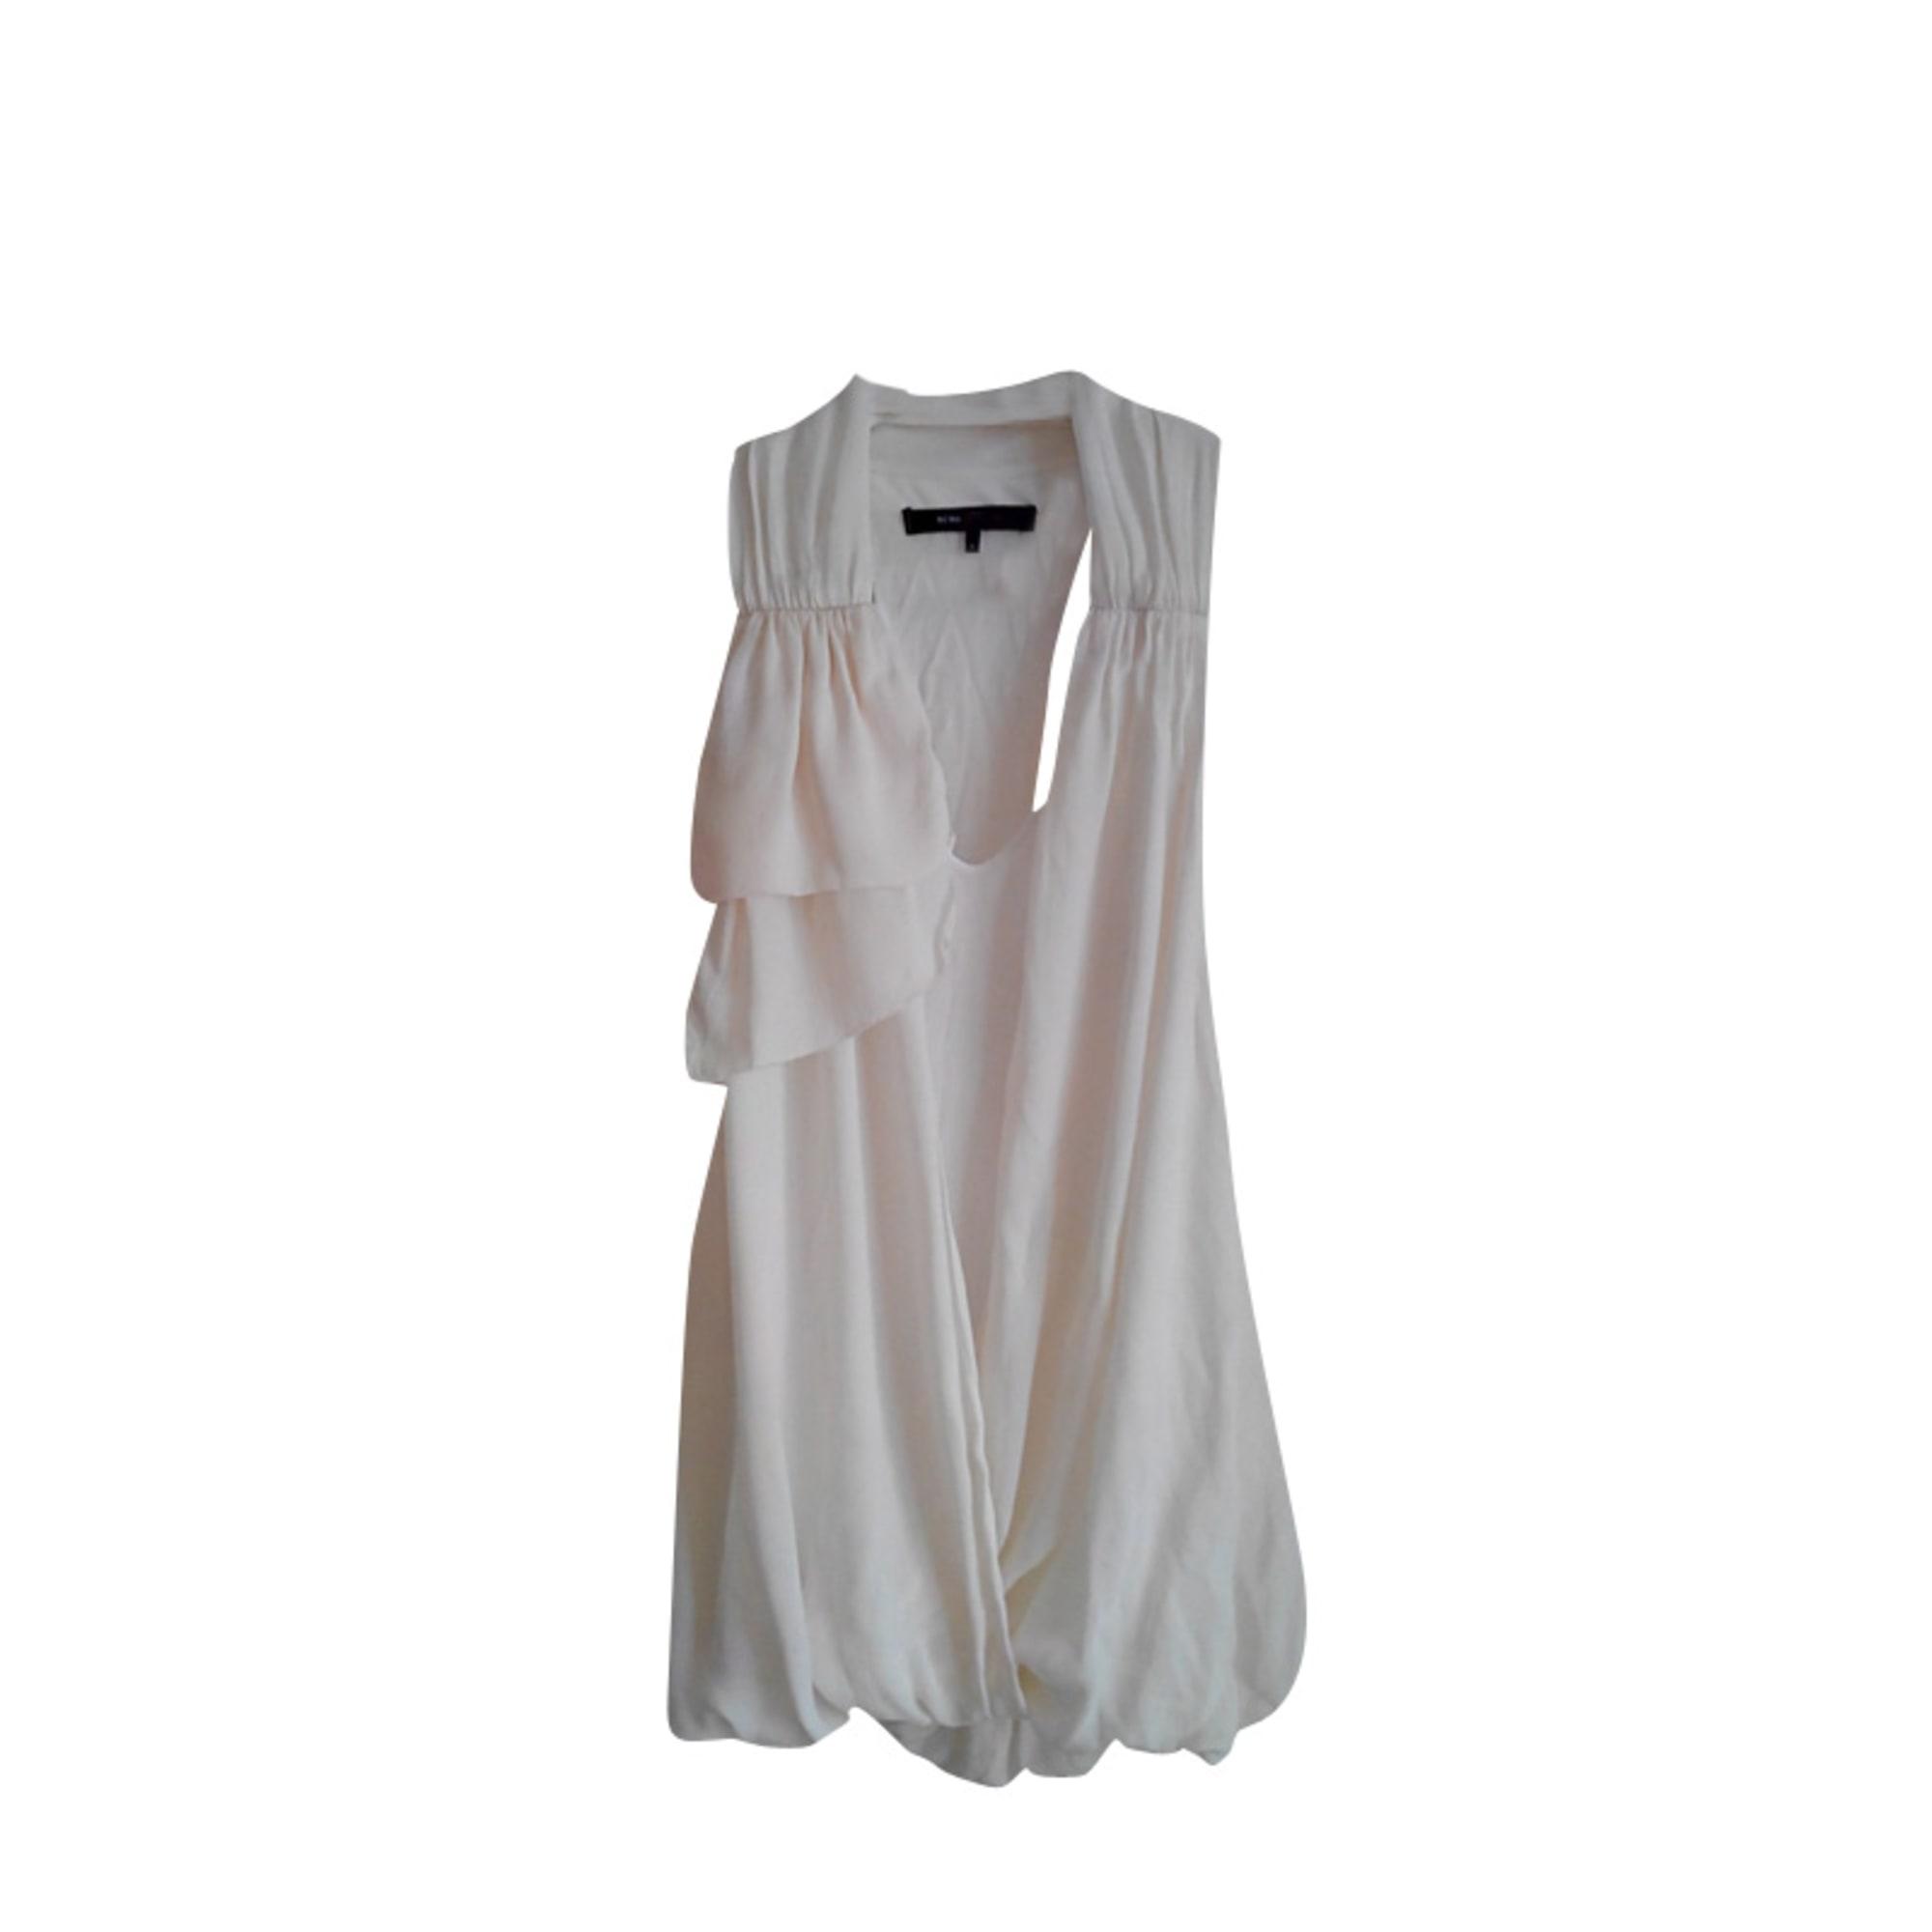 Top, tee-shirt BCBG MAX AZRIA Blanc, blanc cassé, écru